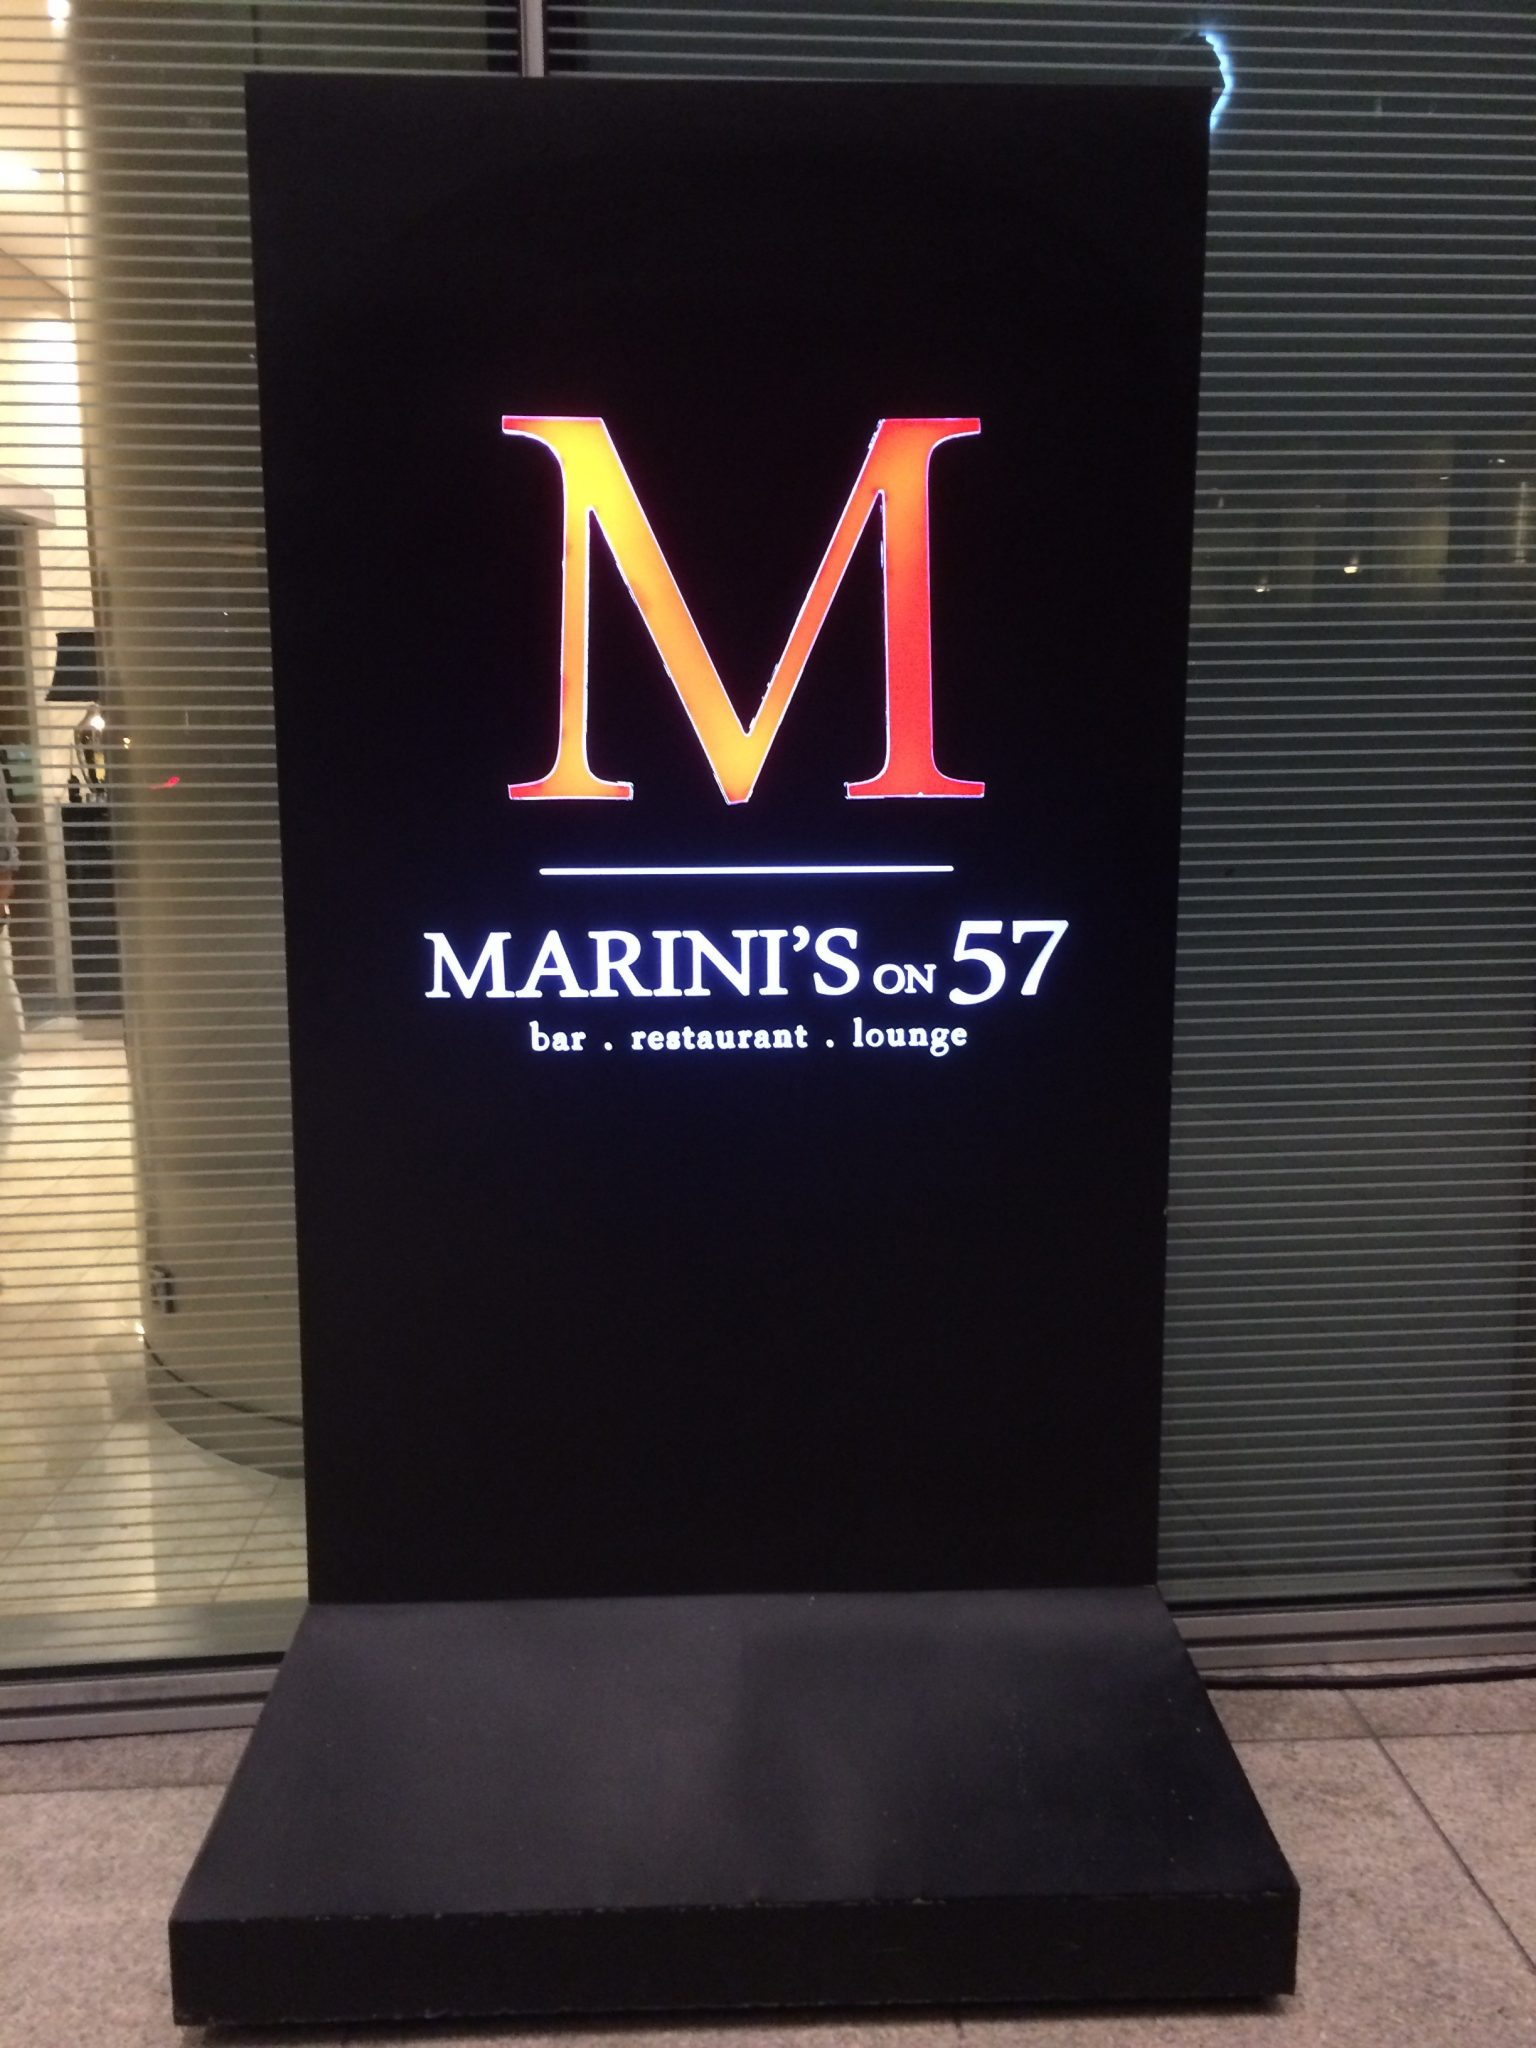 Marinison57